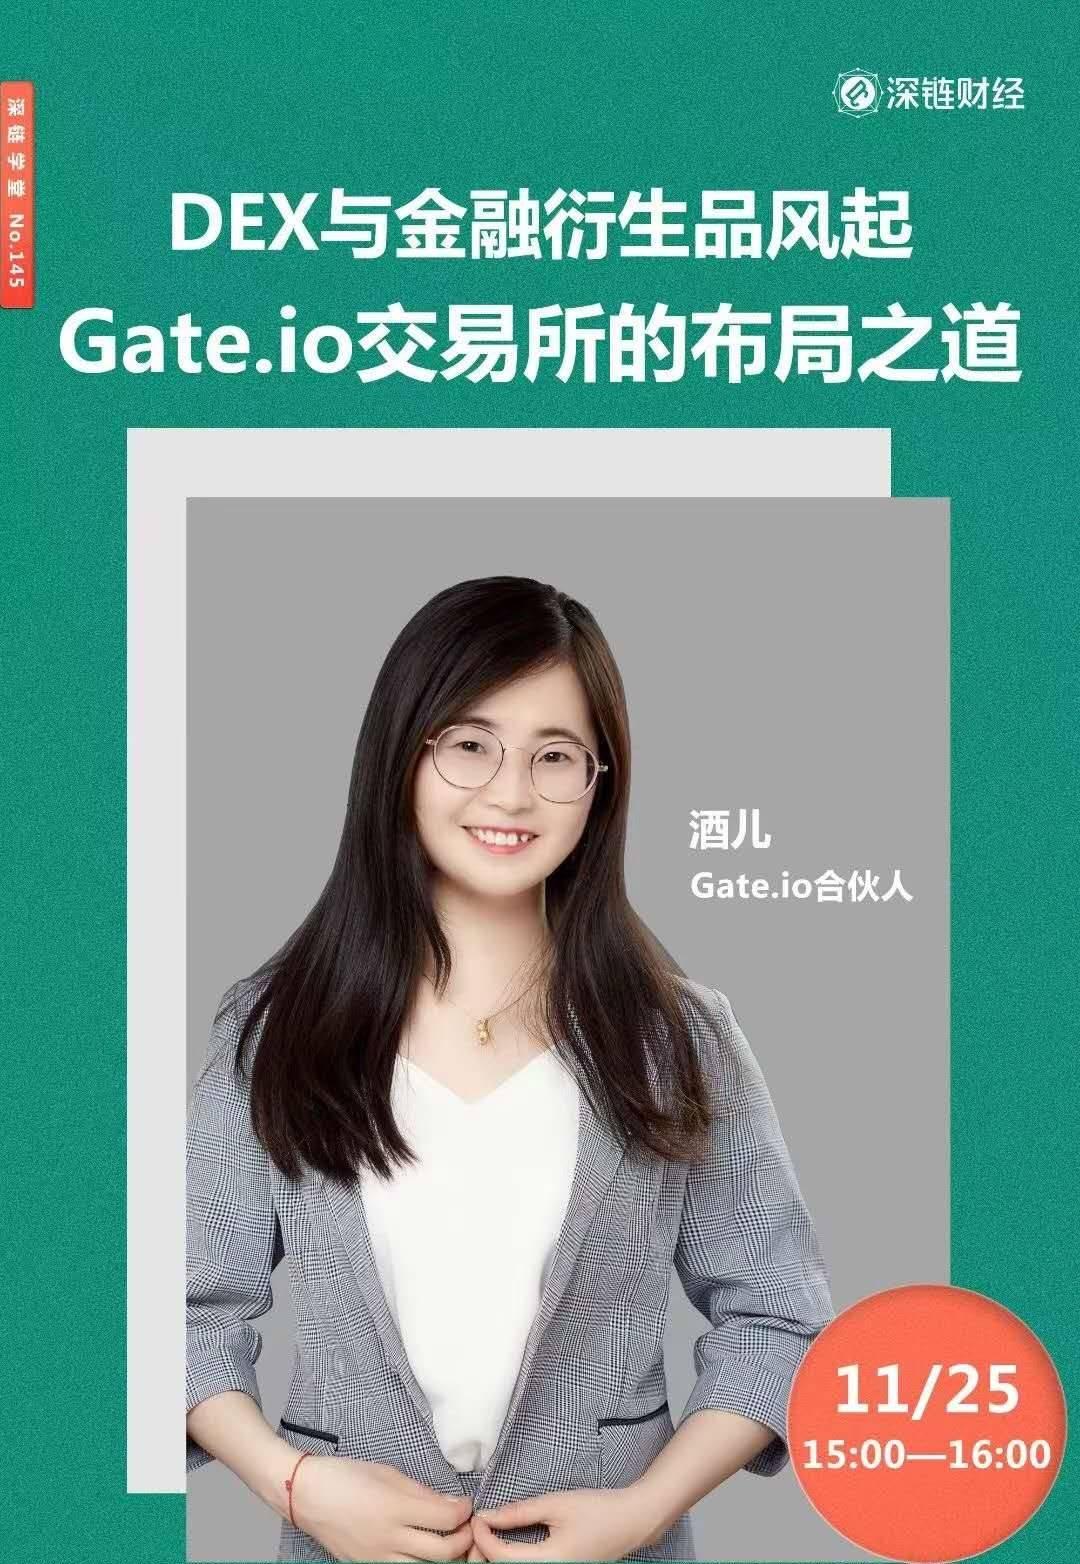 DEX与金融衍生品风起,Gate.io交易所的布局之道